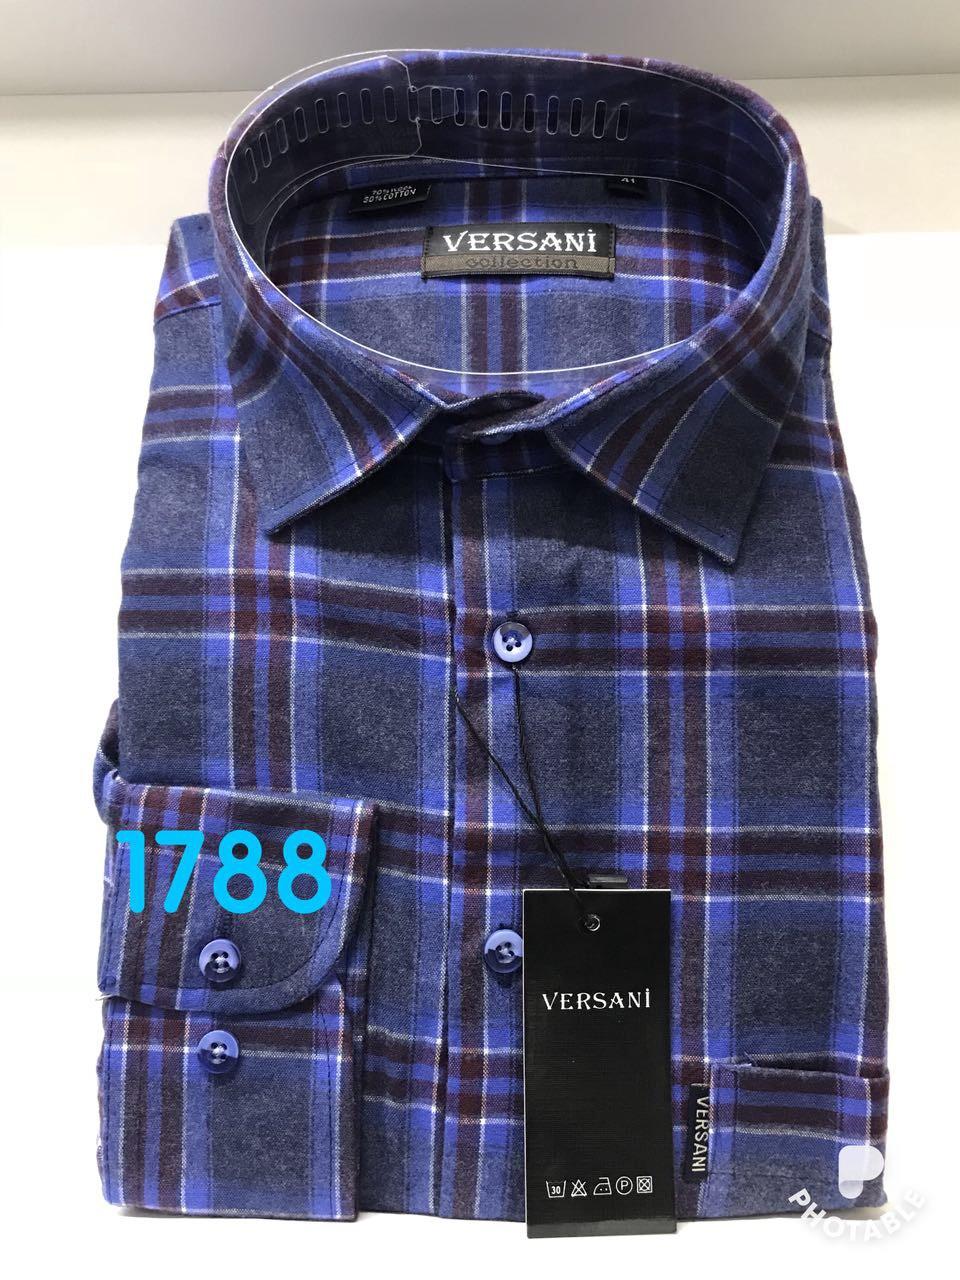 Мужская рубашка кашемир VERSANI-1788